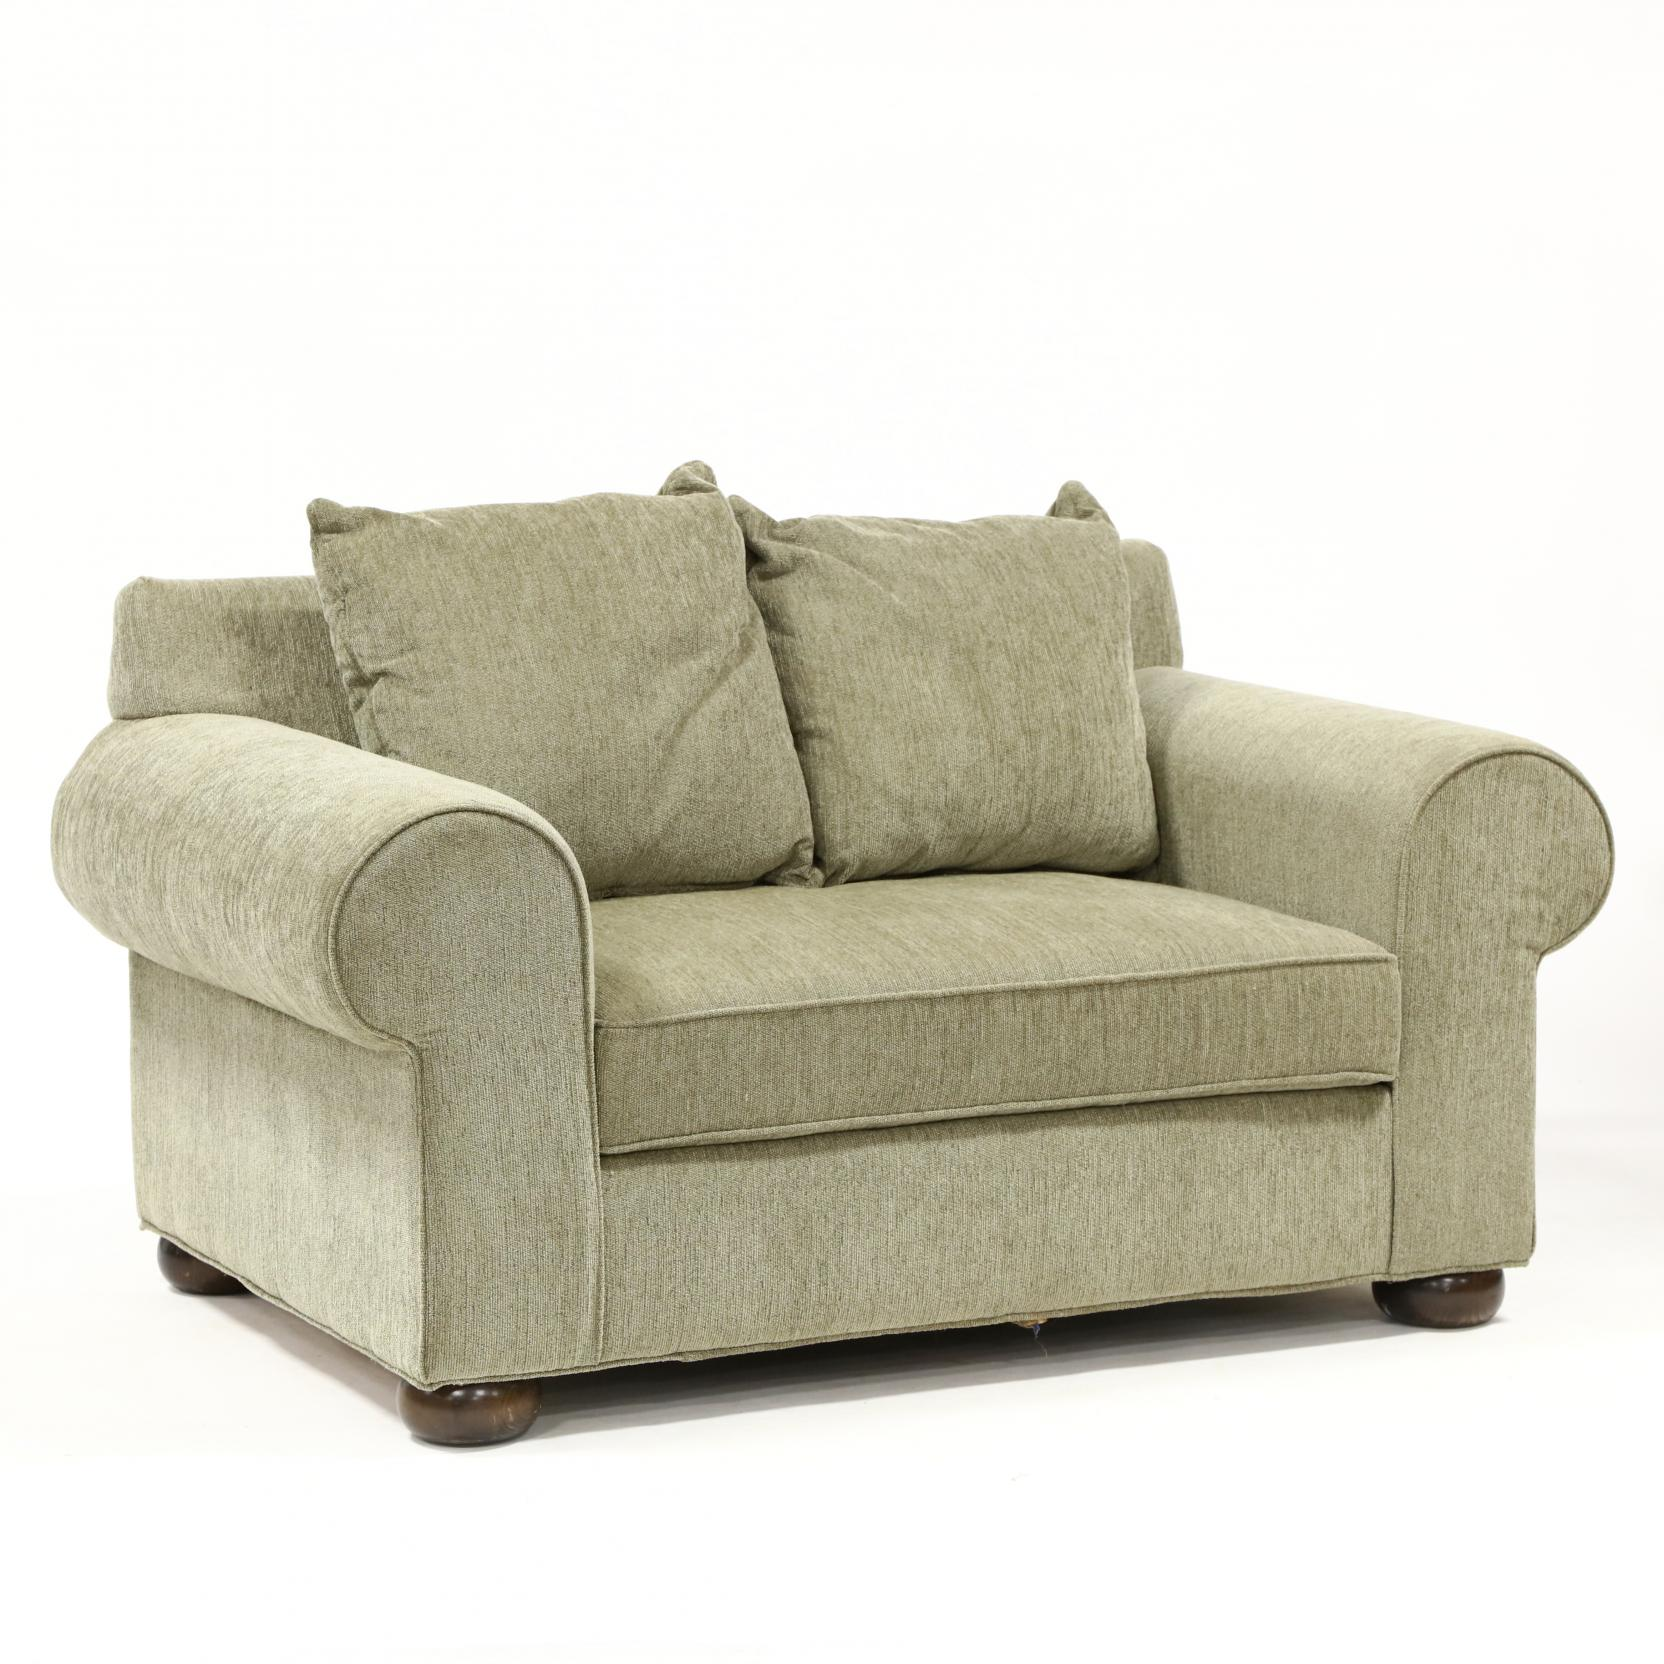 contemporary-diminuitive-sleeper-sofa